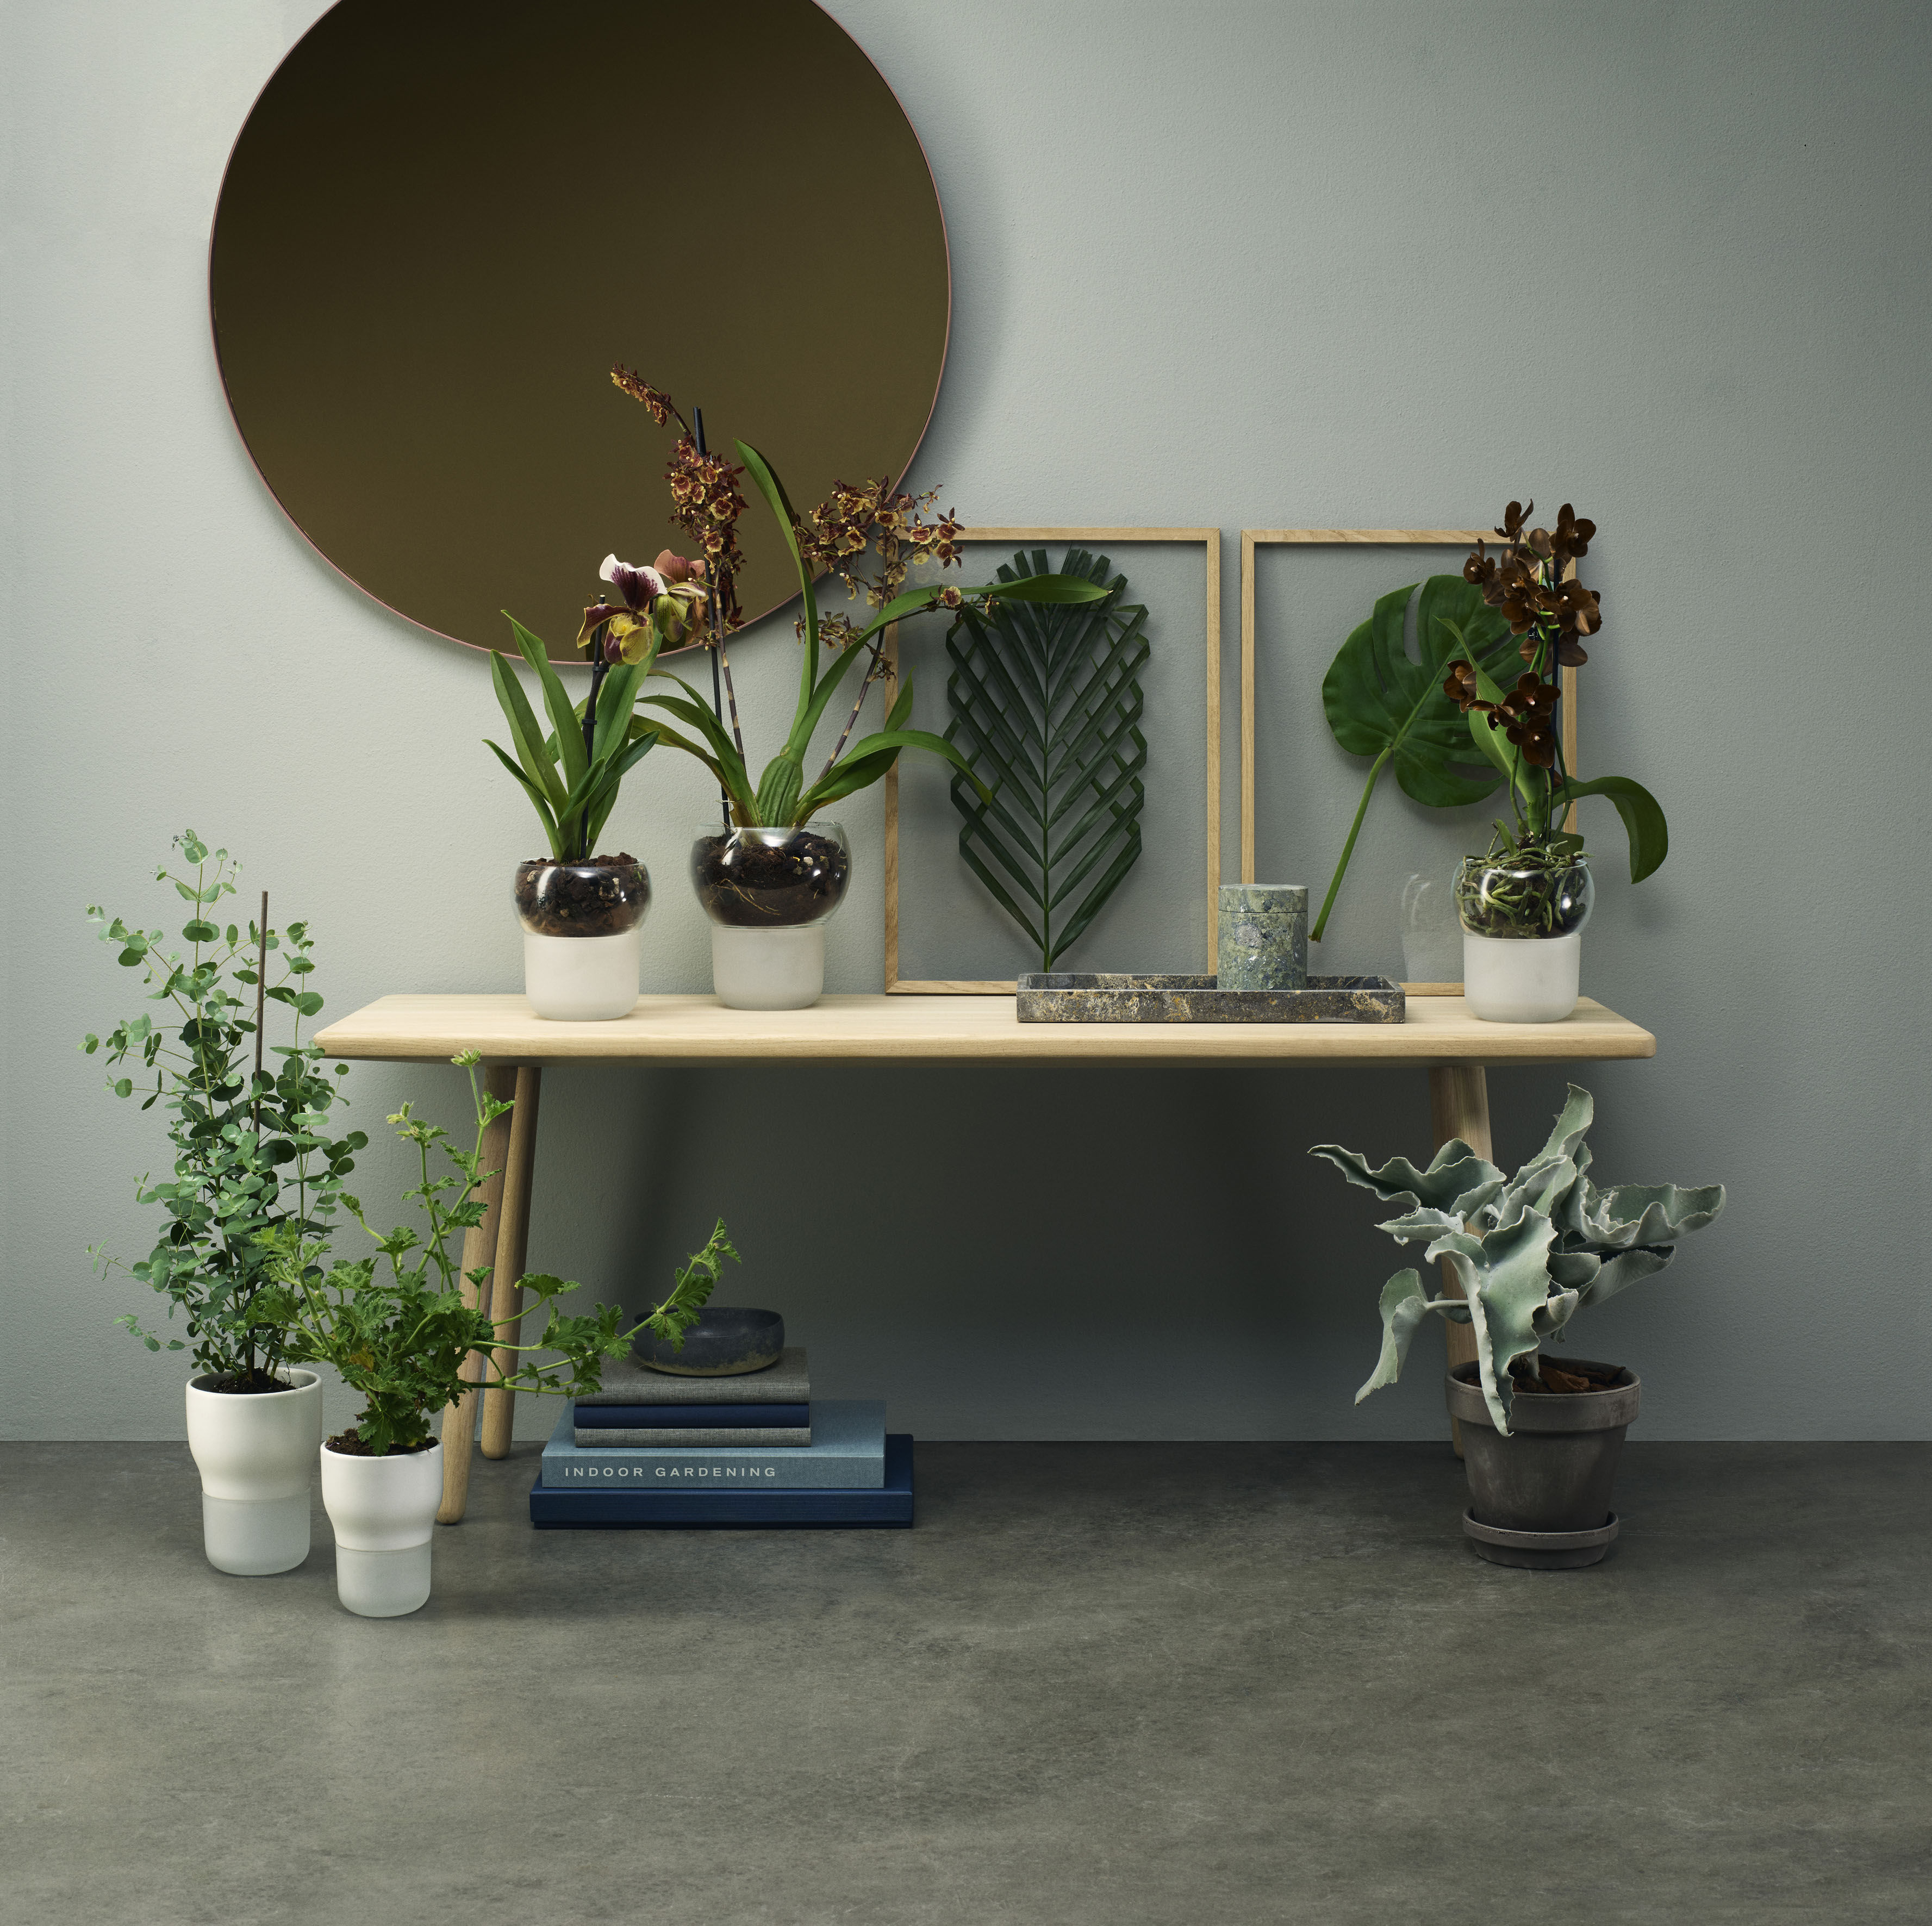 gr e s 13 cm f r orchideen eva solo blumentopf mit wasserreservoir. Black Bedroom Furniture Sets. Home Design Ideas